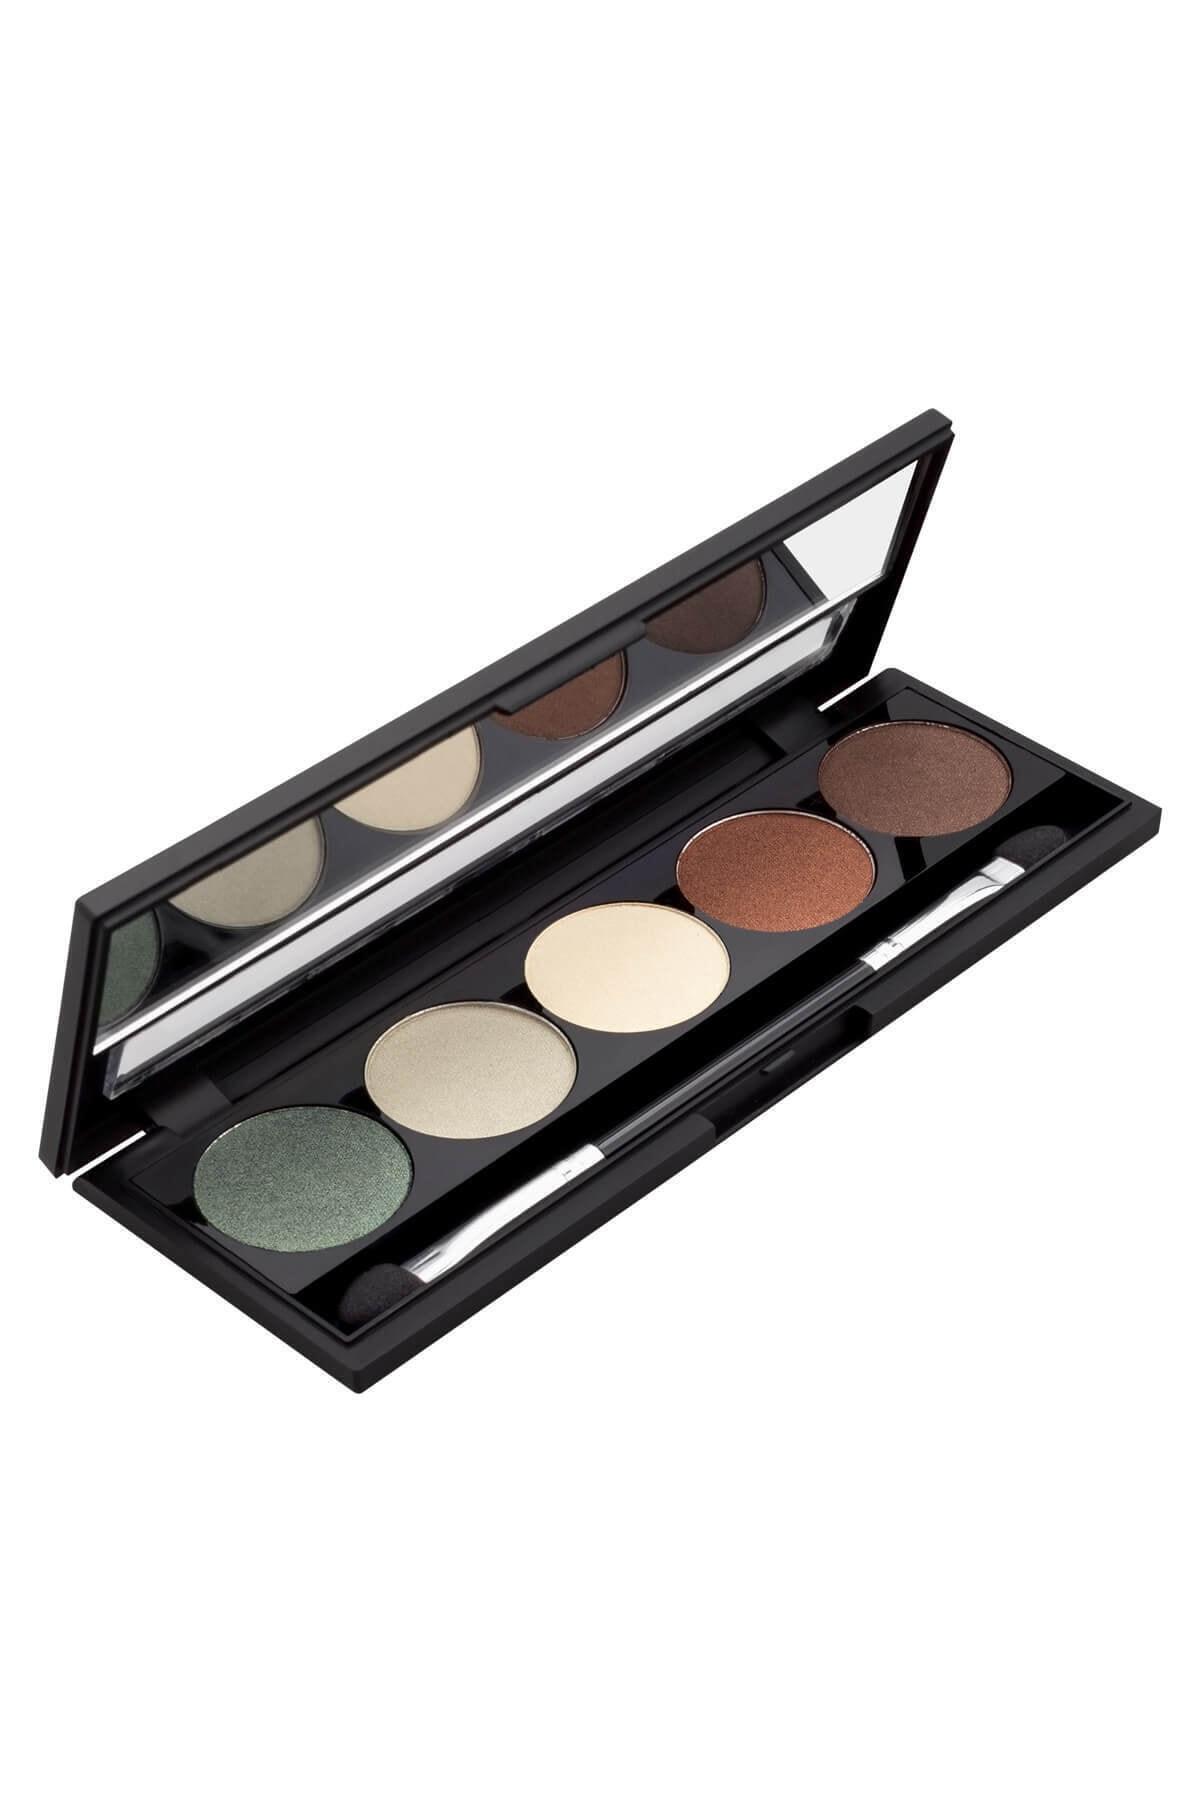 Catherine Arley 5?li Göz Farı Paleti - Palette Eyeshadow 5 Colors 01 8691167489030 1